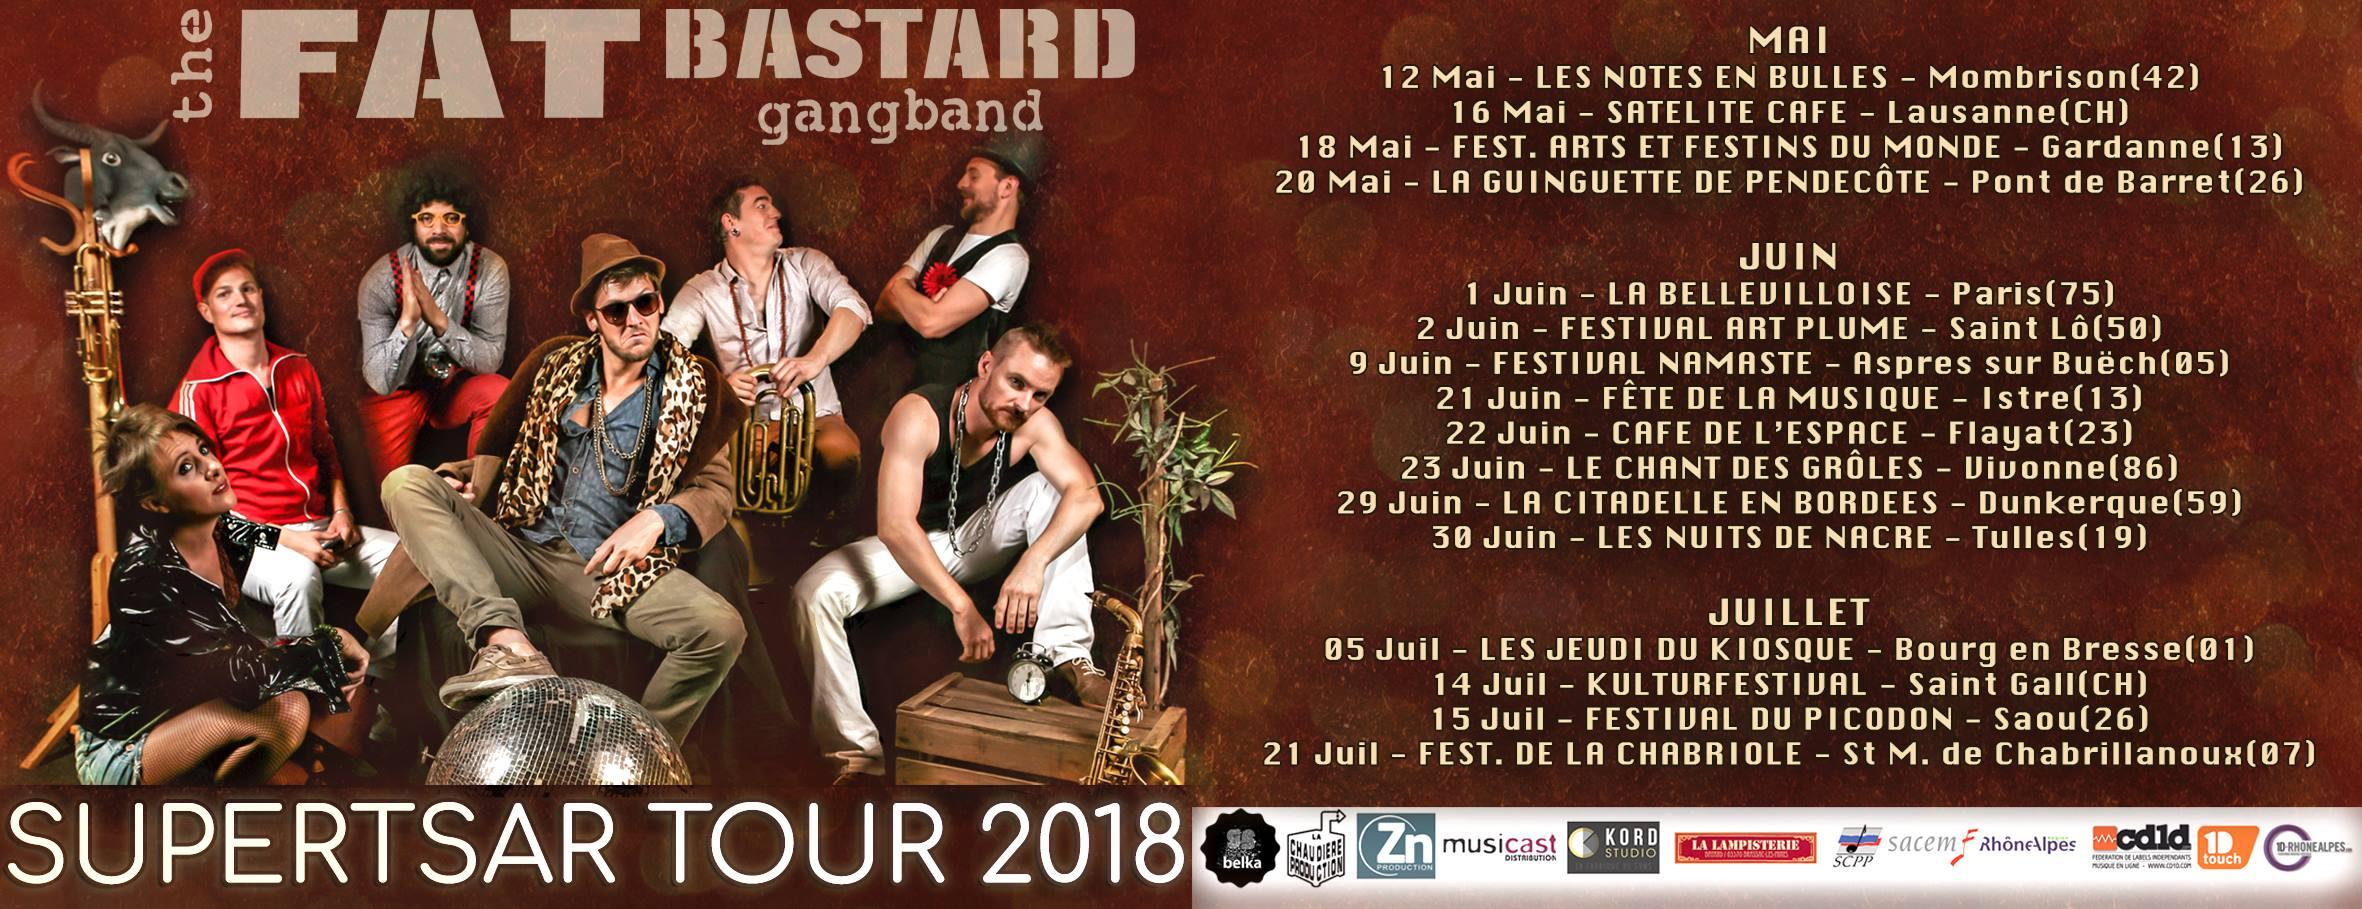 dates de tournée de the fat bastard gangband